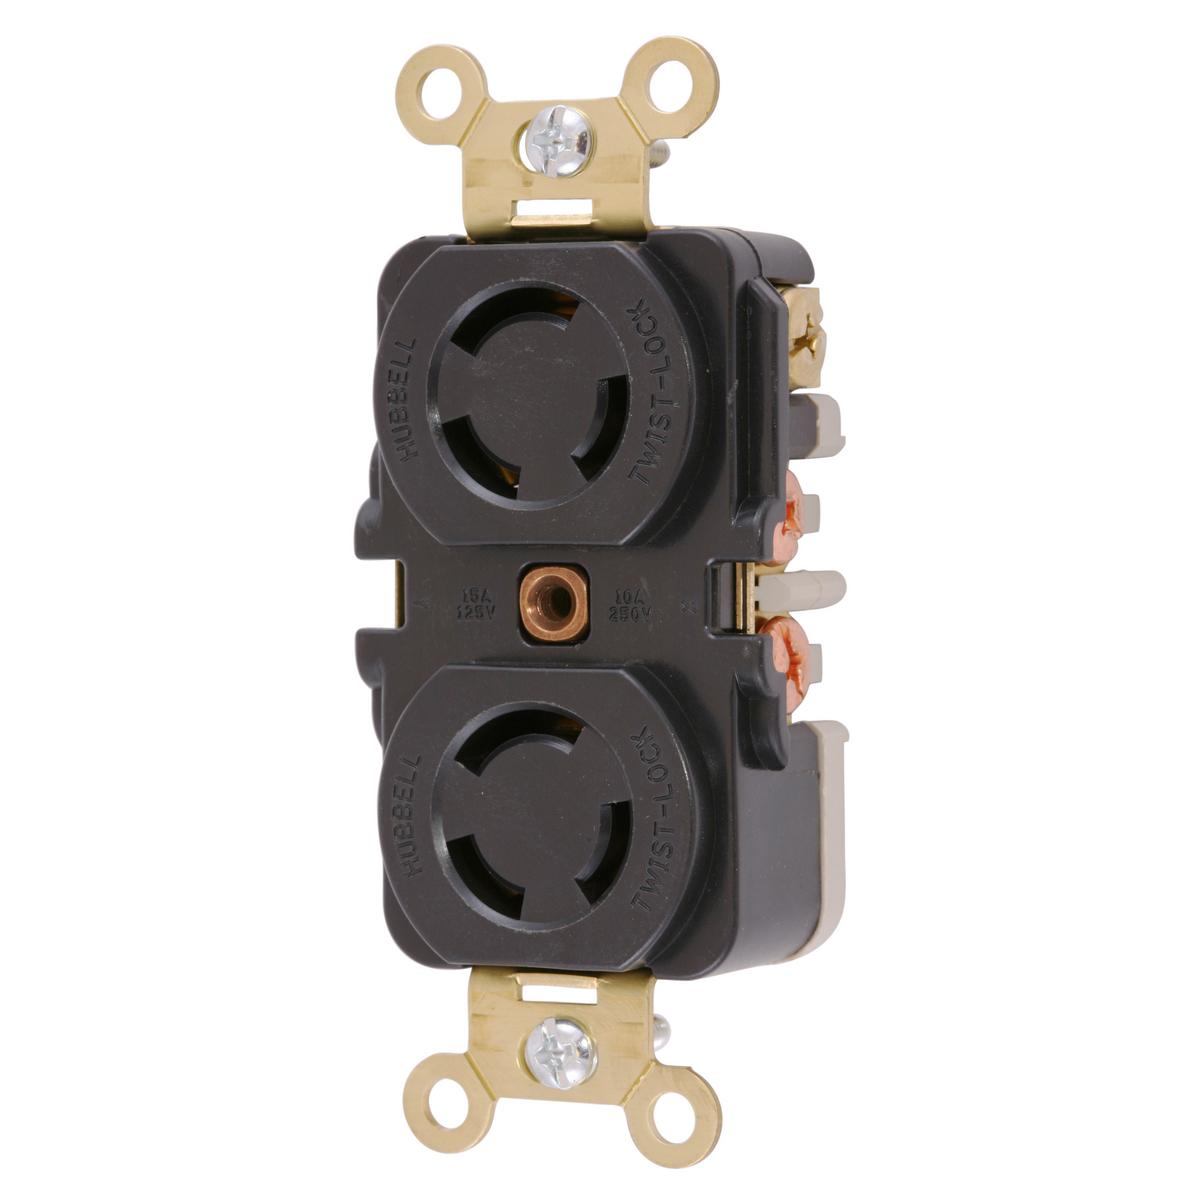 Hubbell HBL7580 10 Amp 250 VAC 3-Pole 3-Wire Non-NEMA Black Duplex Locking Receptacle